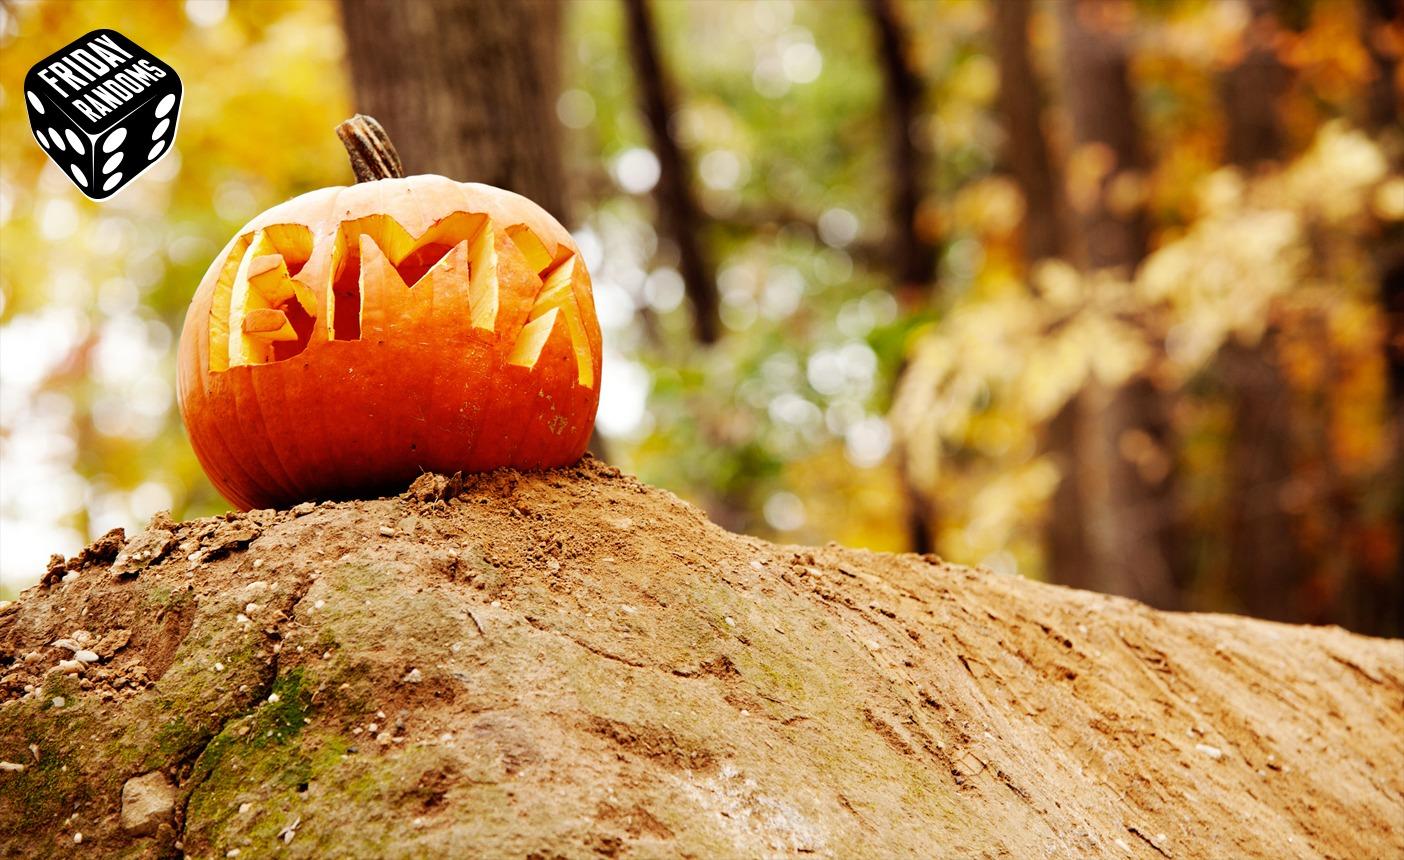 FRIDAY RANDOMS: 5 Spooky Halloween BMX Edits From The Past